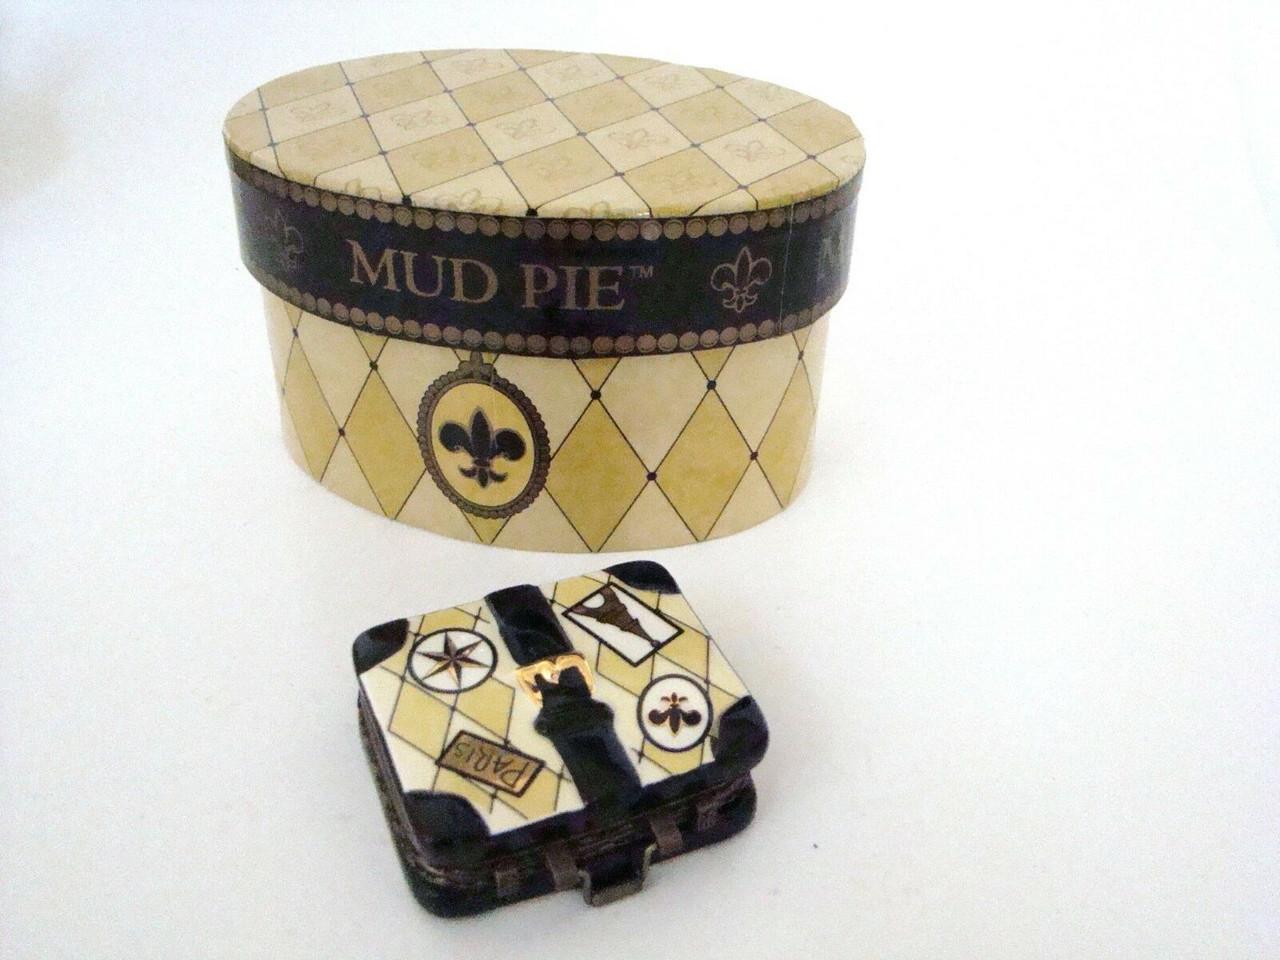 Mud Pie Porcelain Paris Luggage Porcelain Hinged Box (13927)